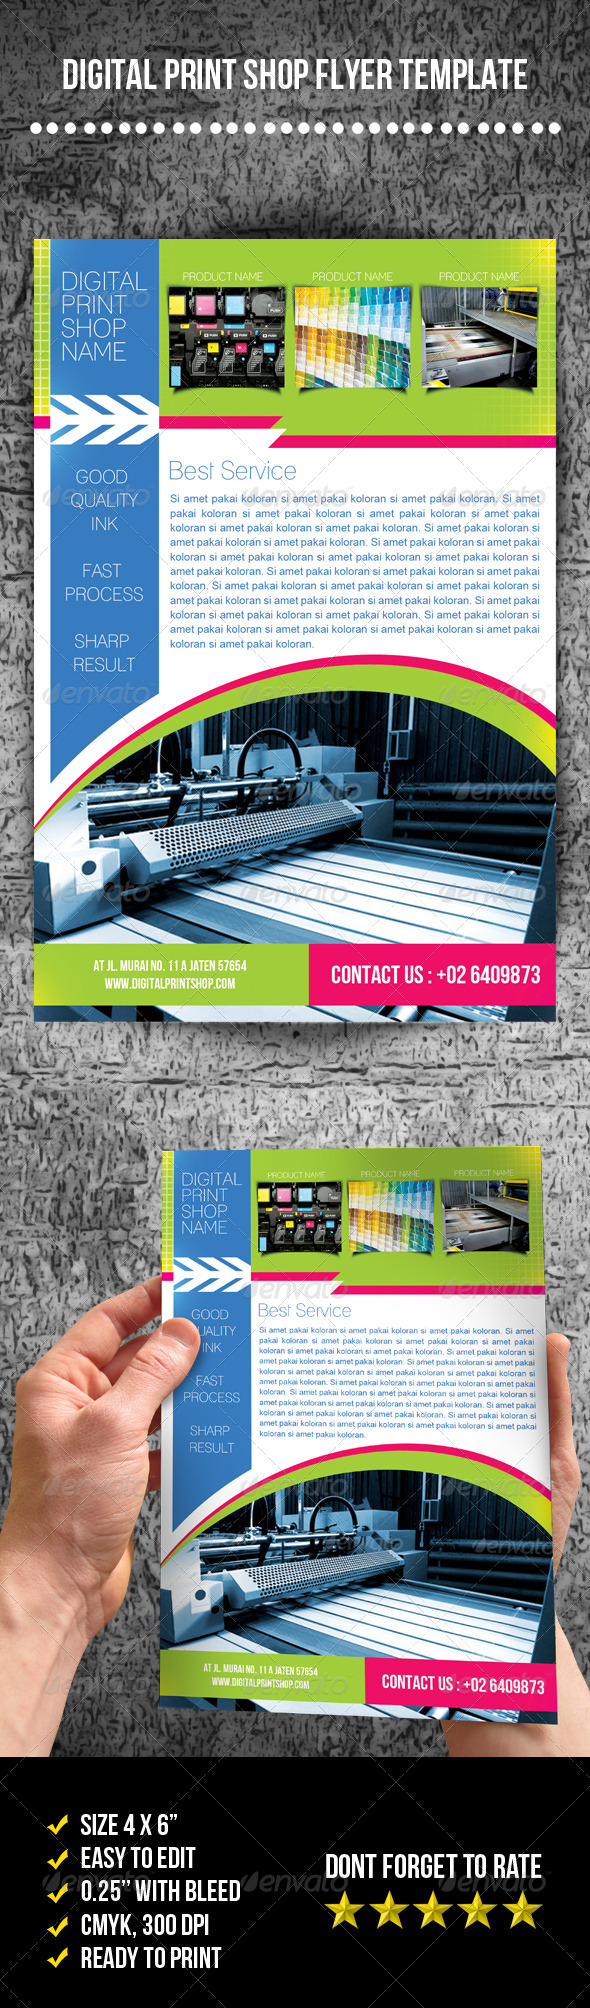 GraphicRiver Digital Print Shop Flyer 7754237